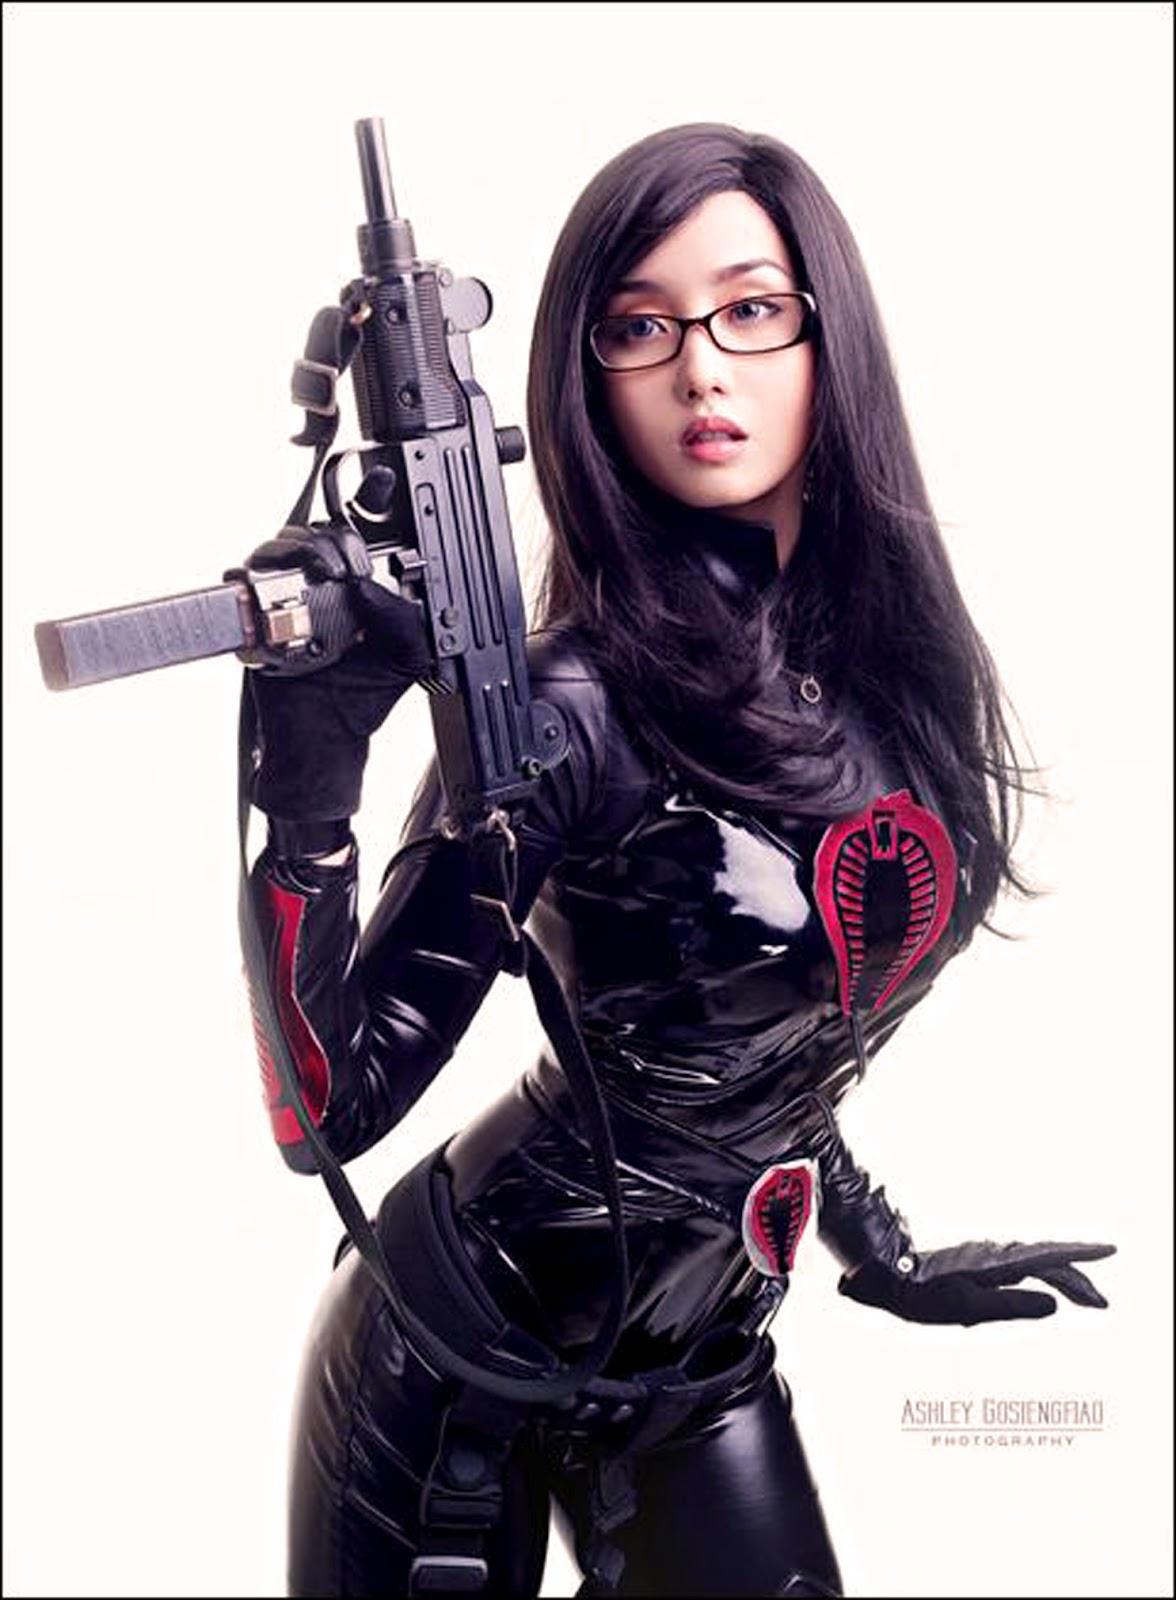 http://3.bp.blogspot.com/-8oFRNZeIzUo/T_u43K7p_iI/AAAAAAAAGVY/NRTIGo4ehxI/s1600/alodia+sexy+cosplay+baroness+GI+Joe+2+g.i.joe+retaliation+movie+comic+con+san+diego+2012+2013+007+poster+actress.jpg